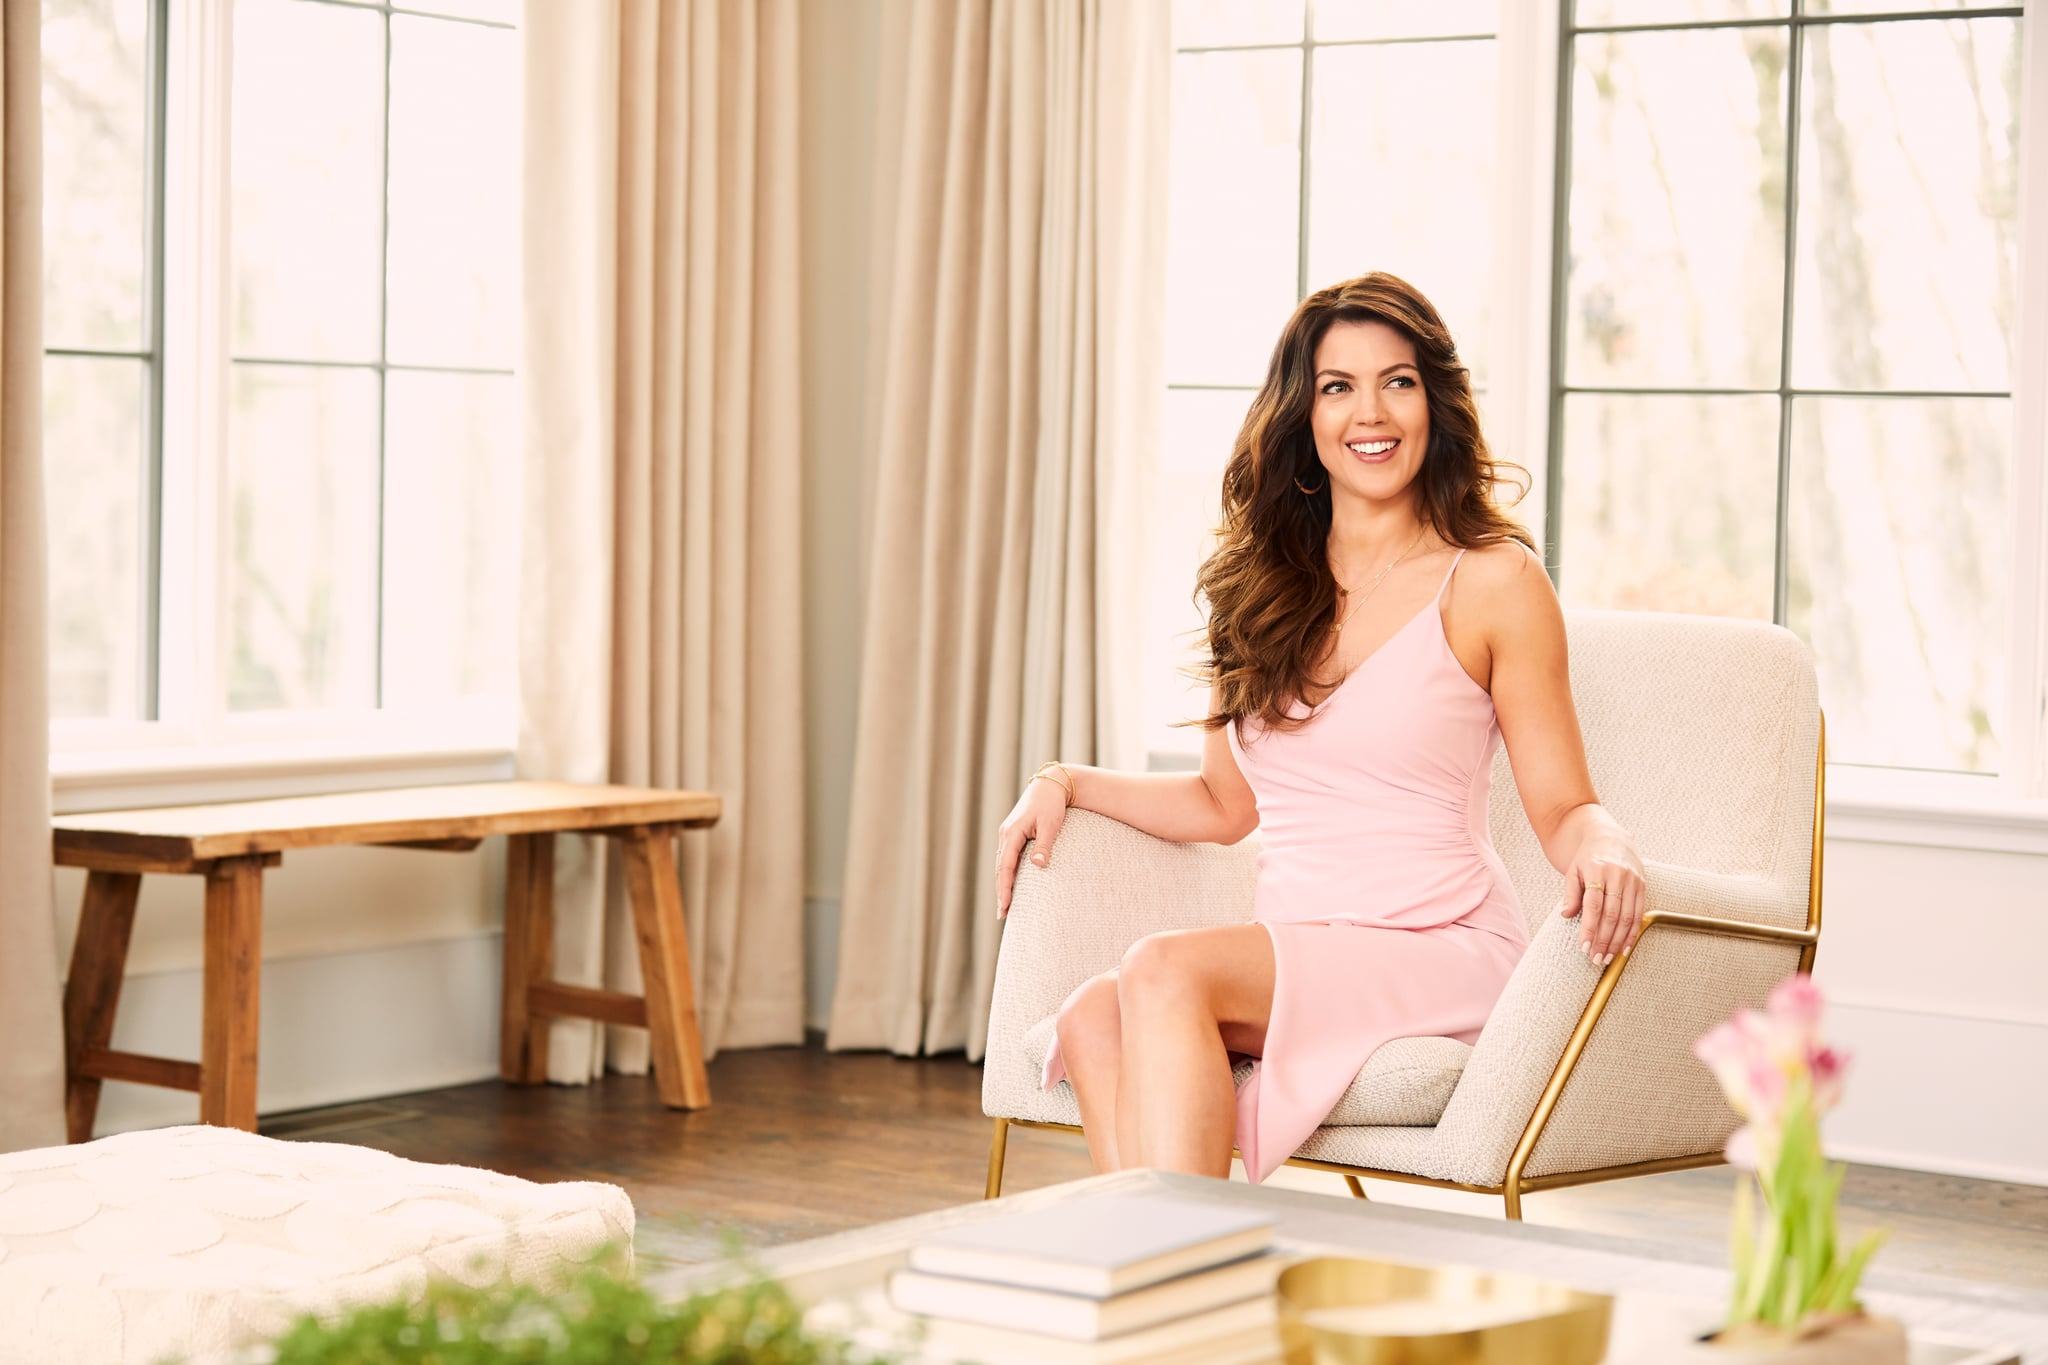 Labour OF LOVE: Kristy Katzmann in Labour OF LOVE, premiering Thursday, May 21 (9:00-10:00 PM ET/PT) on FOX.  2020 FOX MEDIA LLC. Cr: Justin Stephens